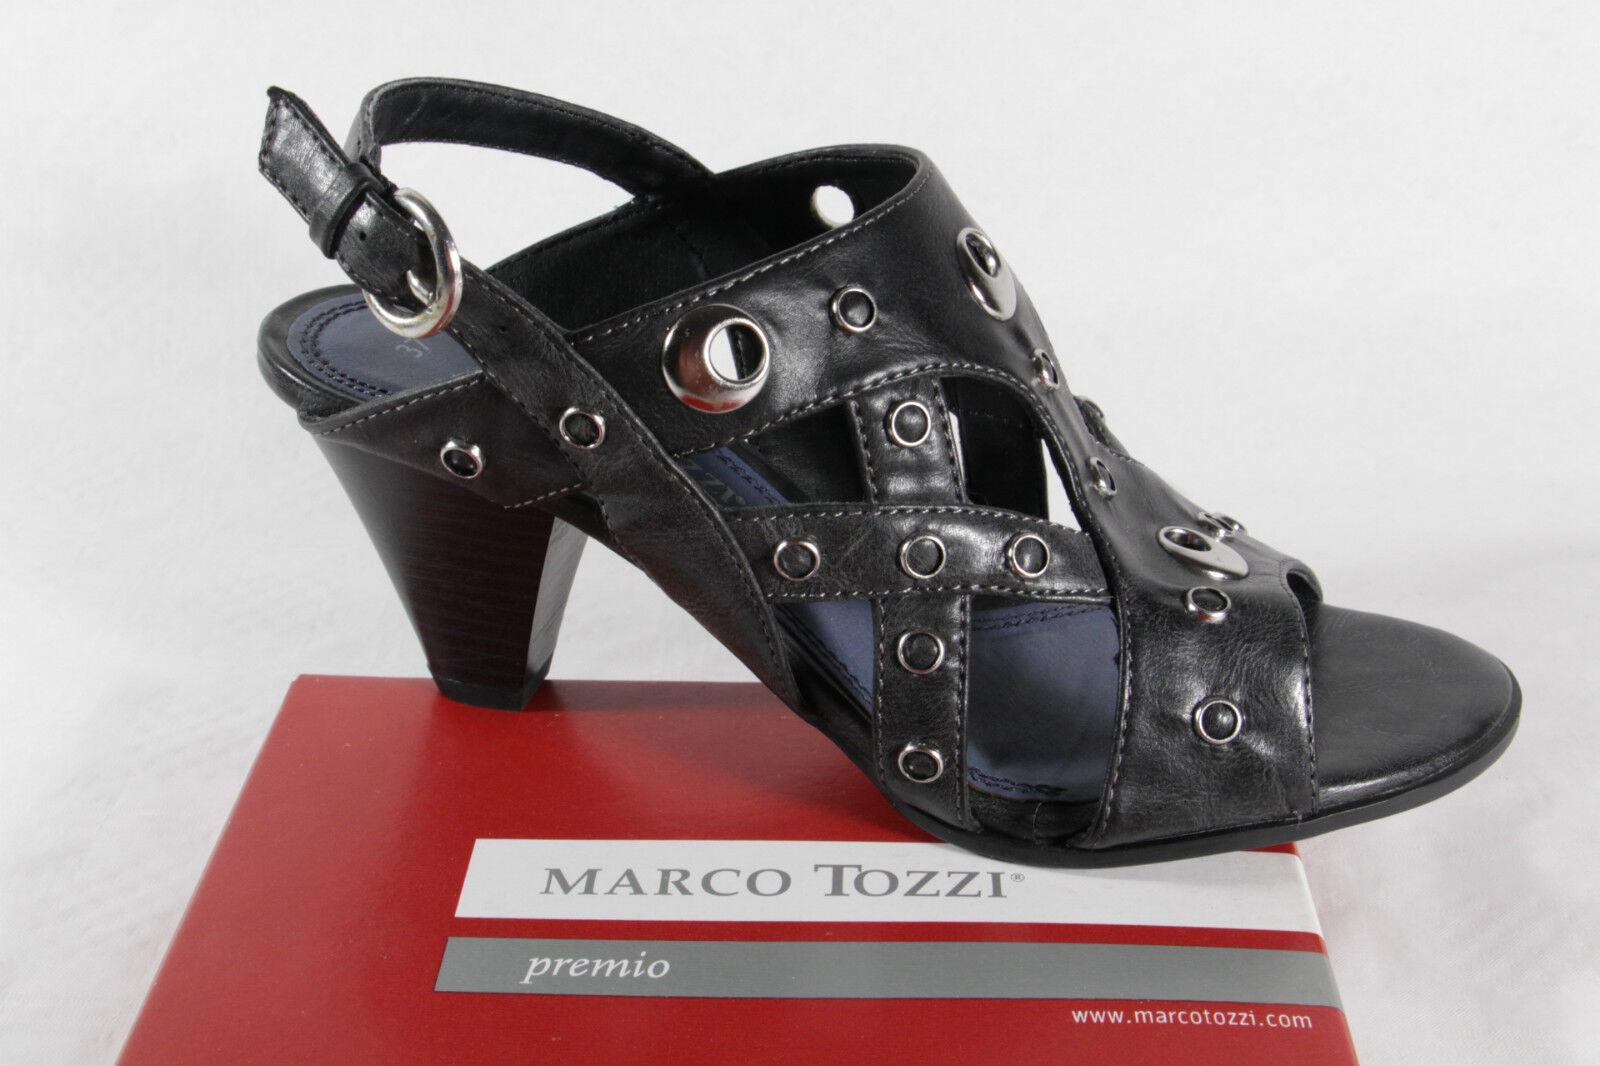 Marco Tozzi Women's Sandals, Black, Rubber Sole New